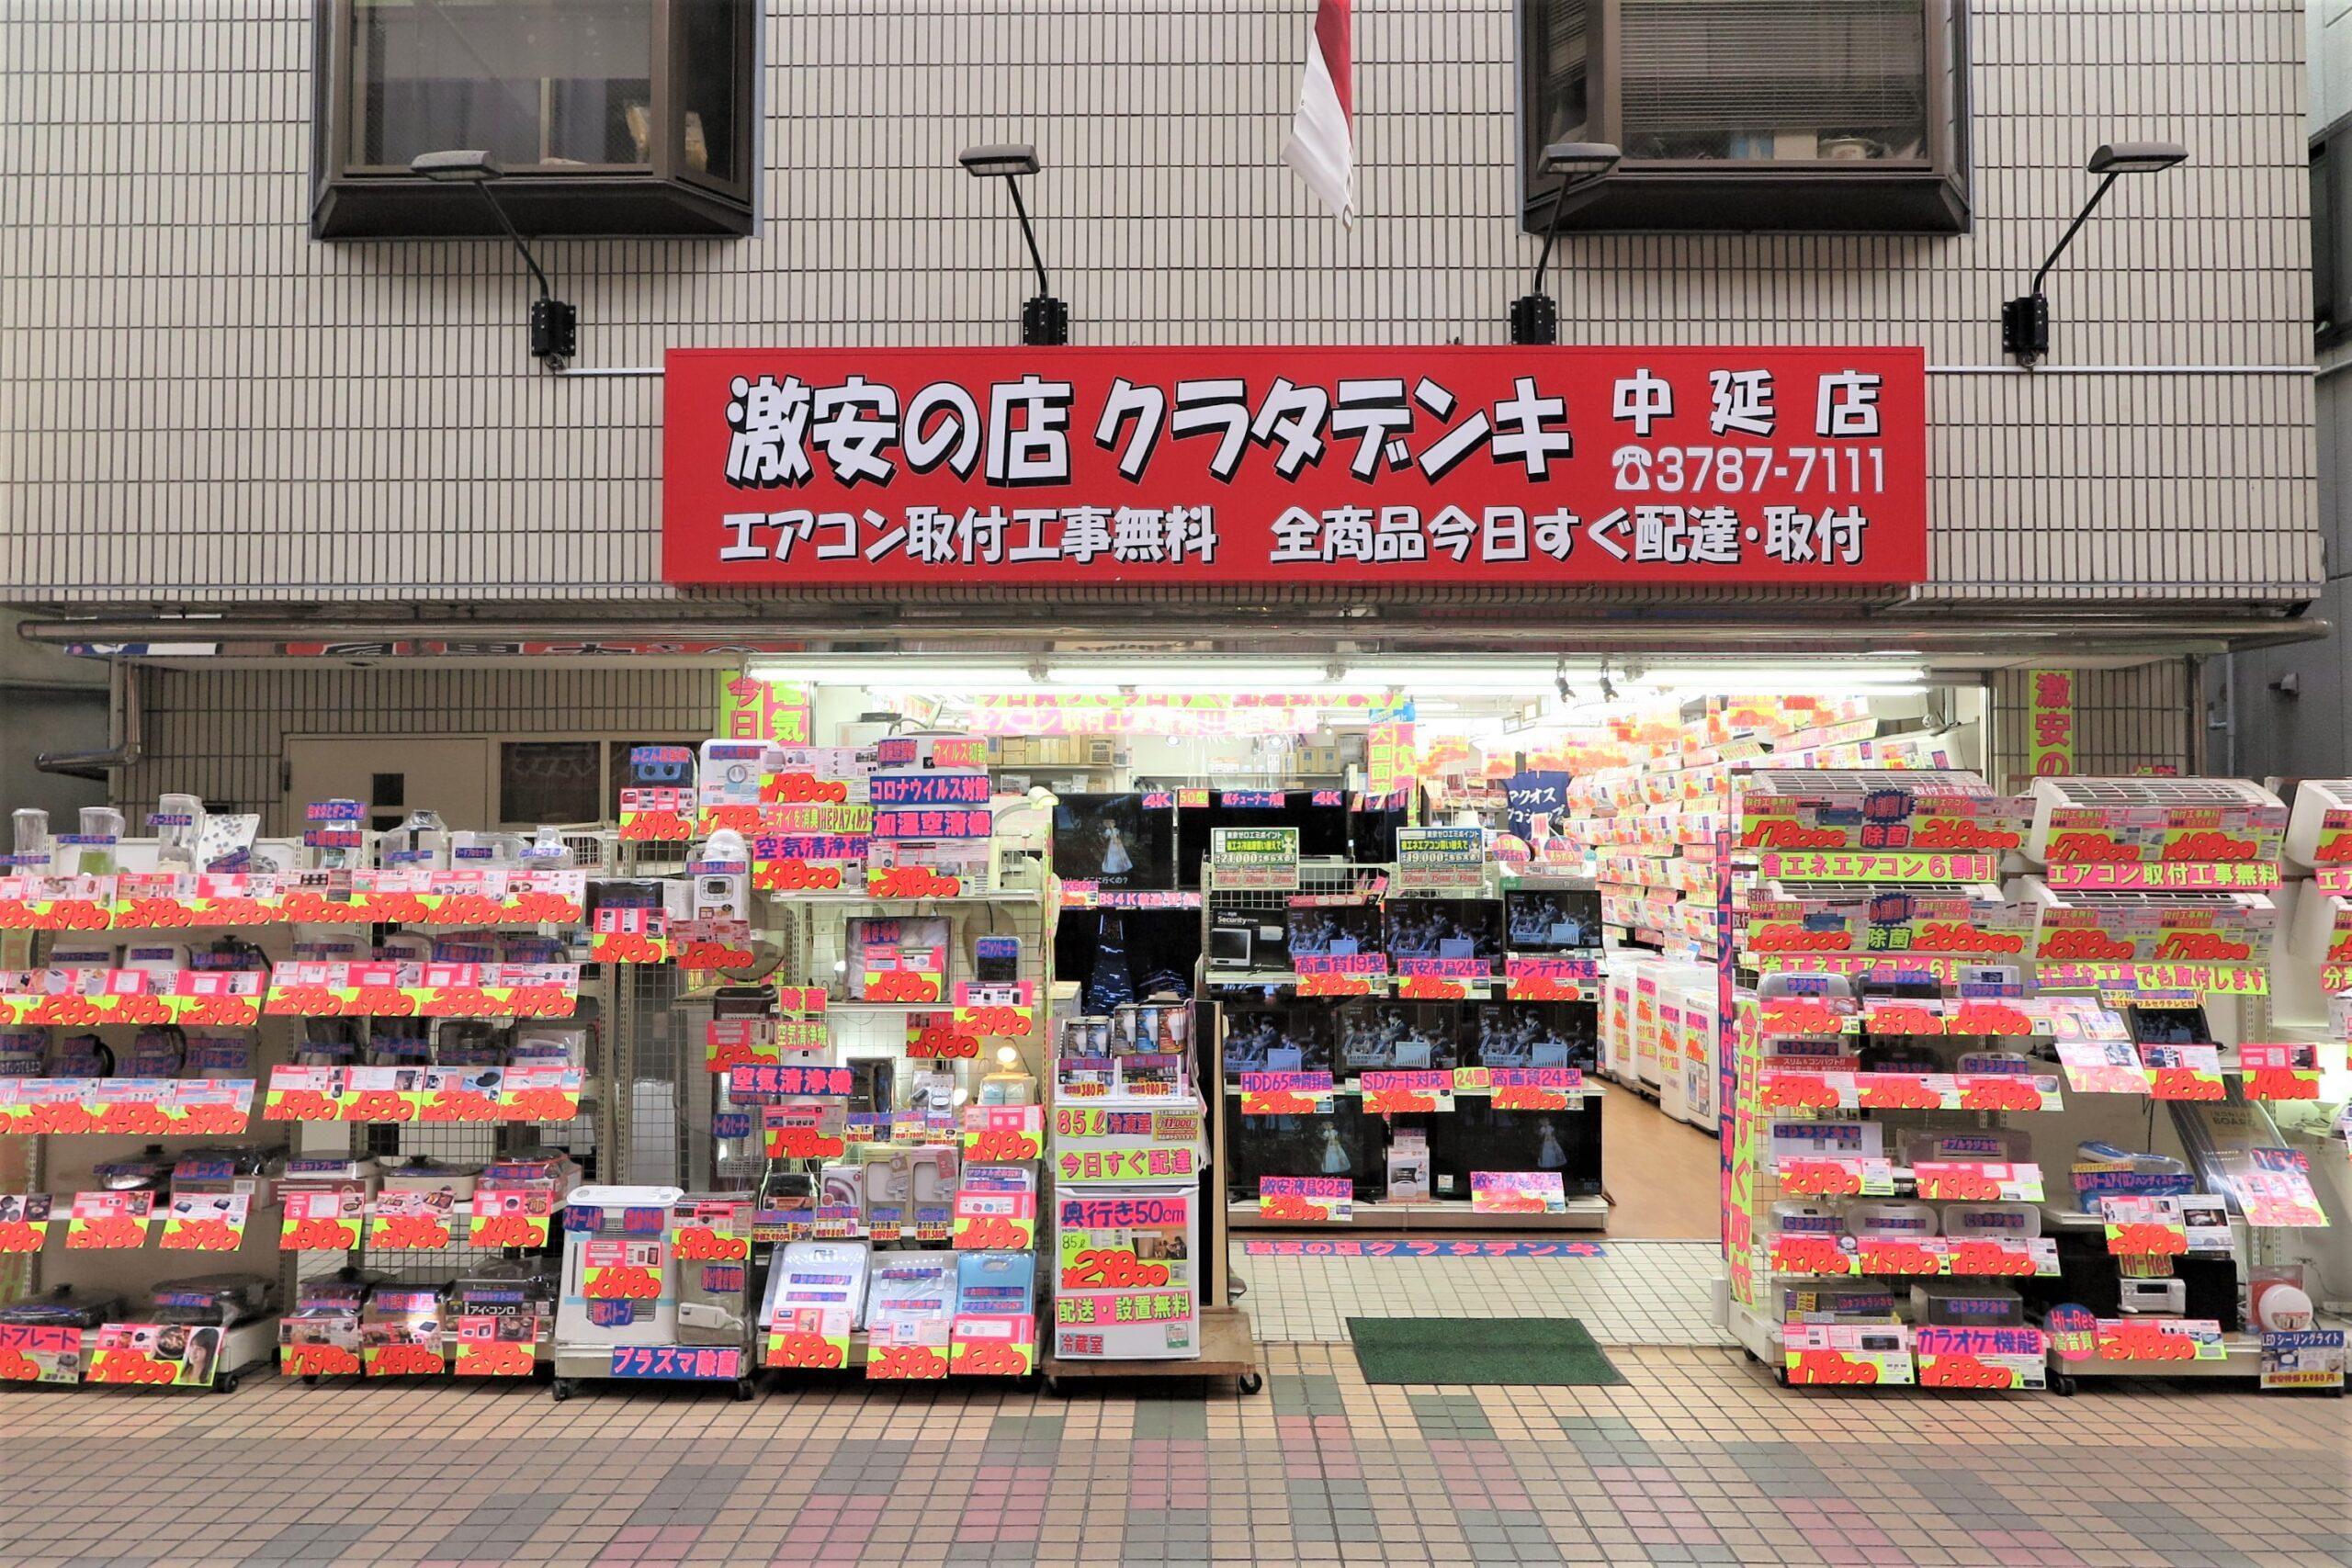 https://nakanobu.com/wp-content/uploads/2021/04/02d7d5b965eafbb378e584666c946e79-scaled.jpg